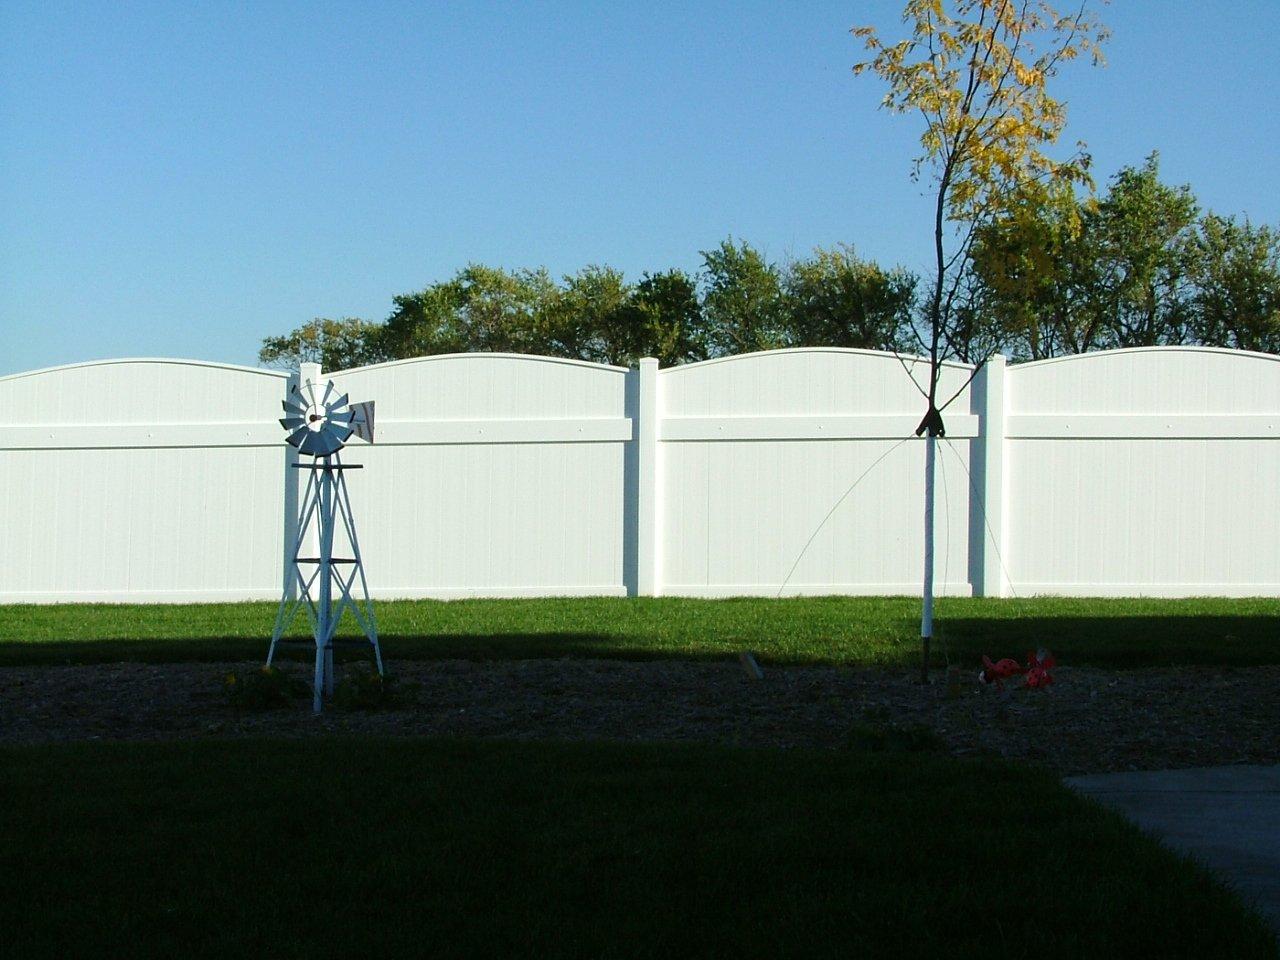 Dakota Fence & Deck 6' white solid pvc scalloped up fence - Omaha and Papillion, Nebraska